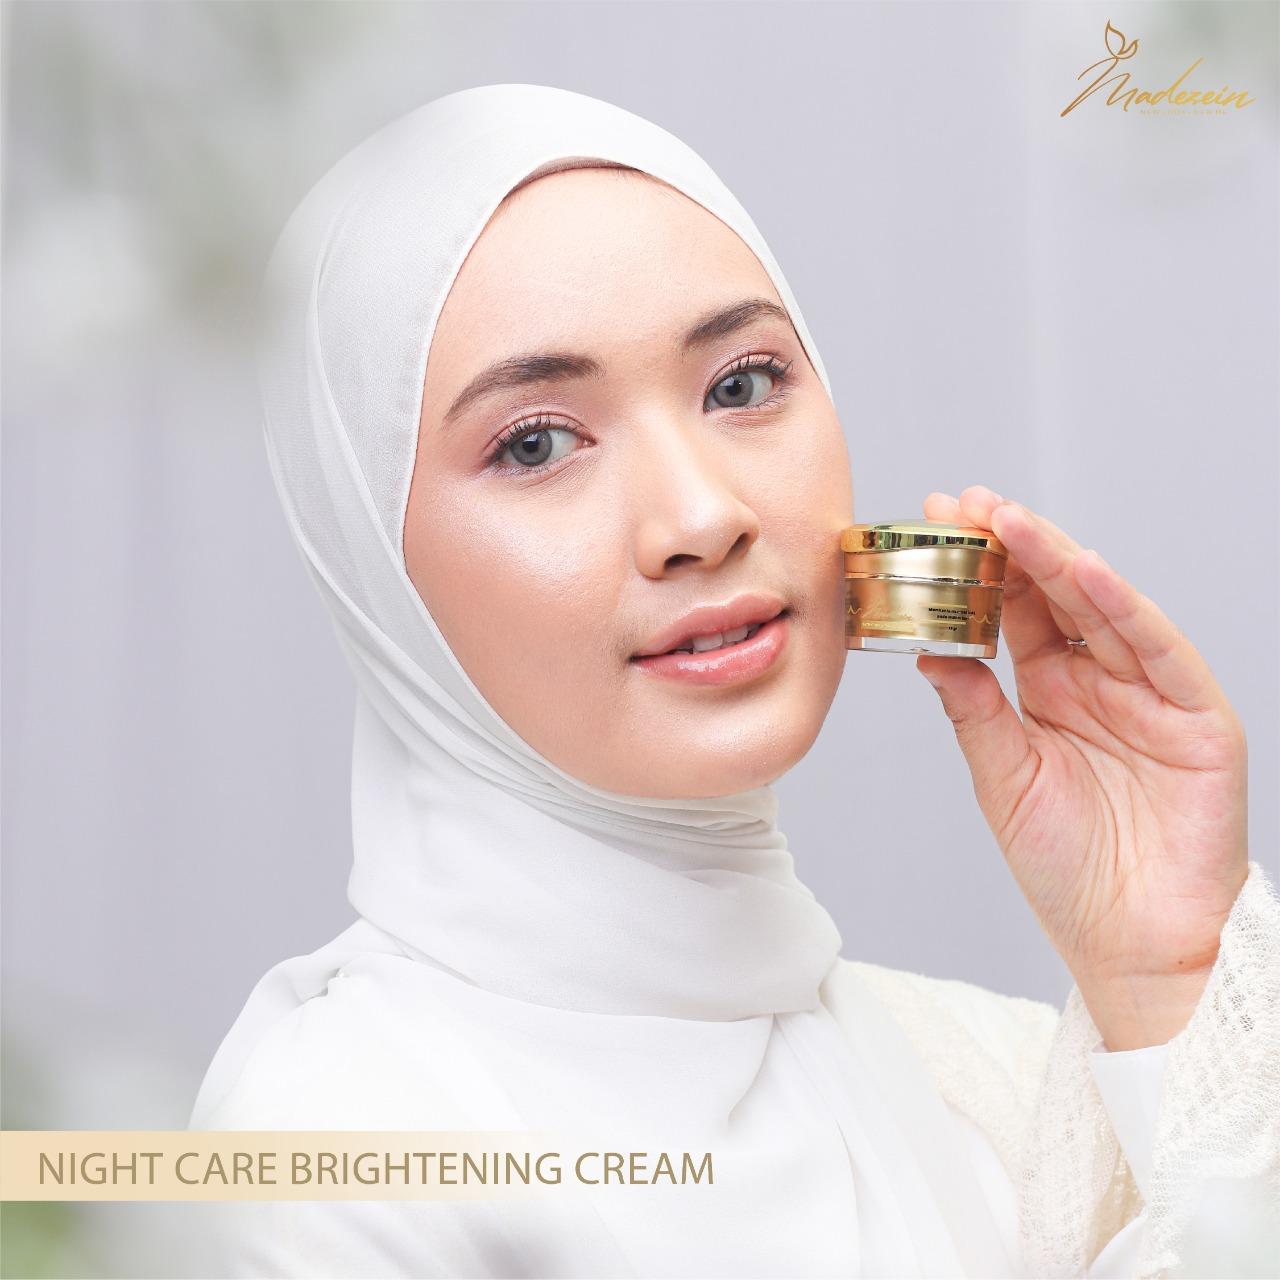 Madezein Night Care Brightening Cream